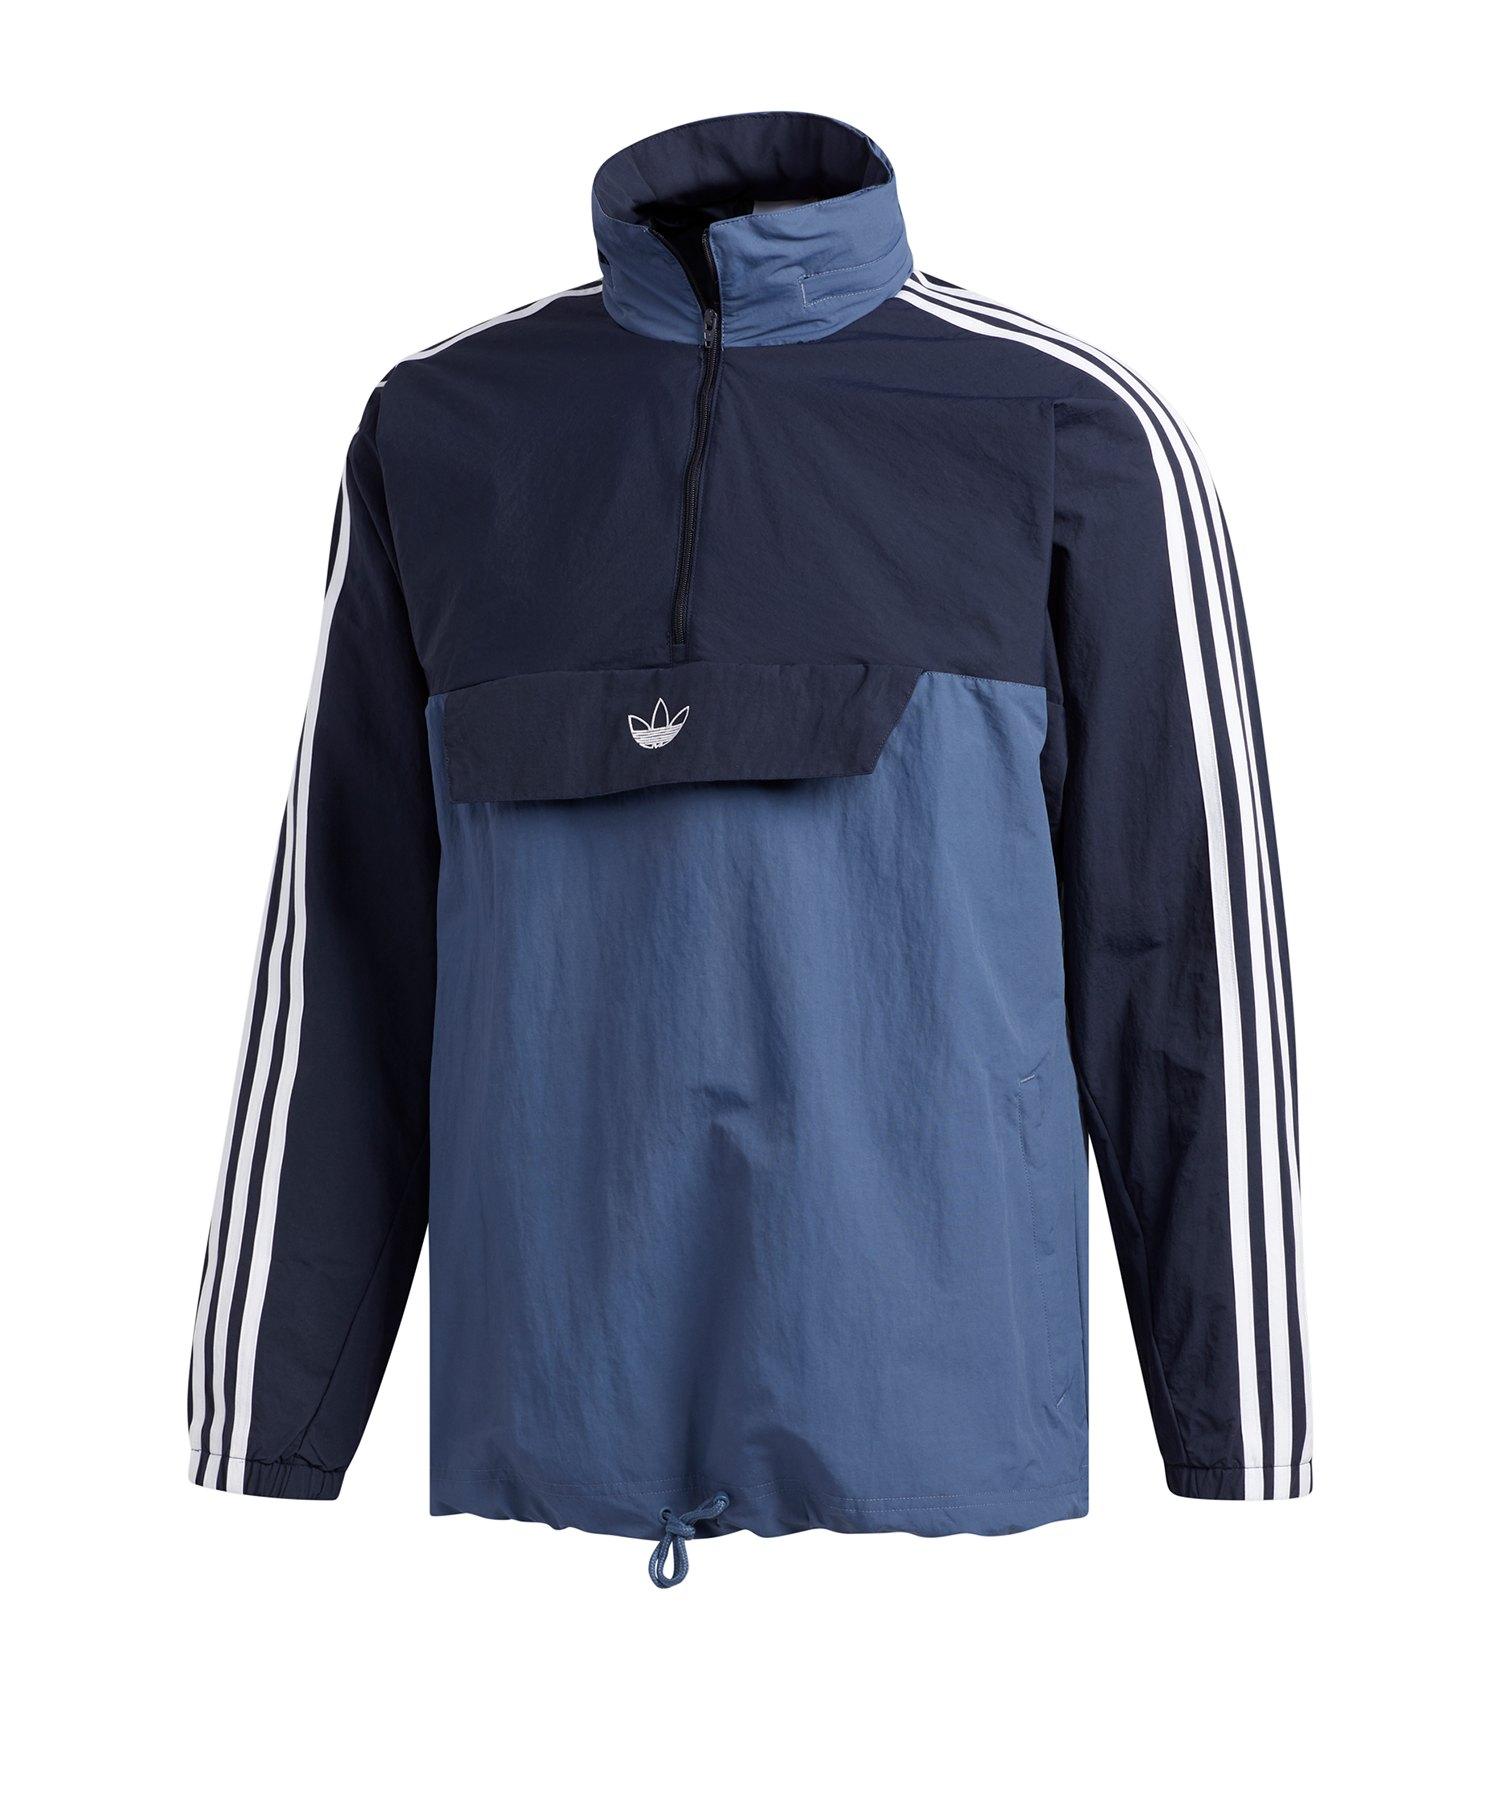 adidas Originals Outline 12 Zip Jacke Blau